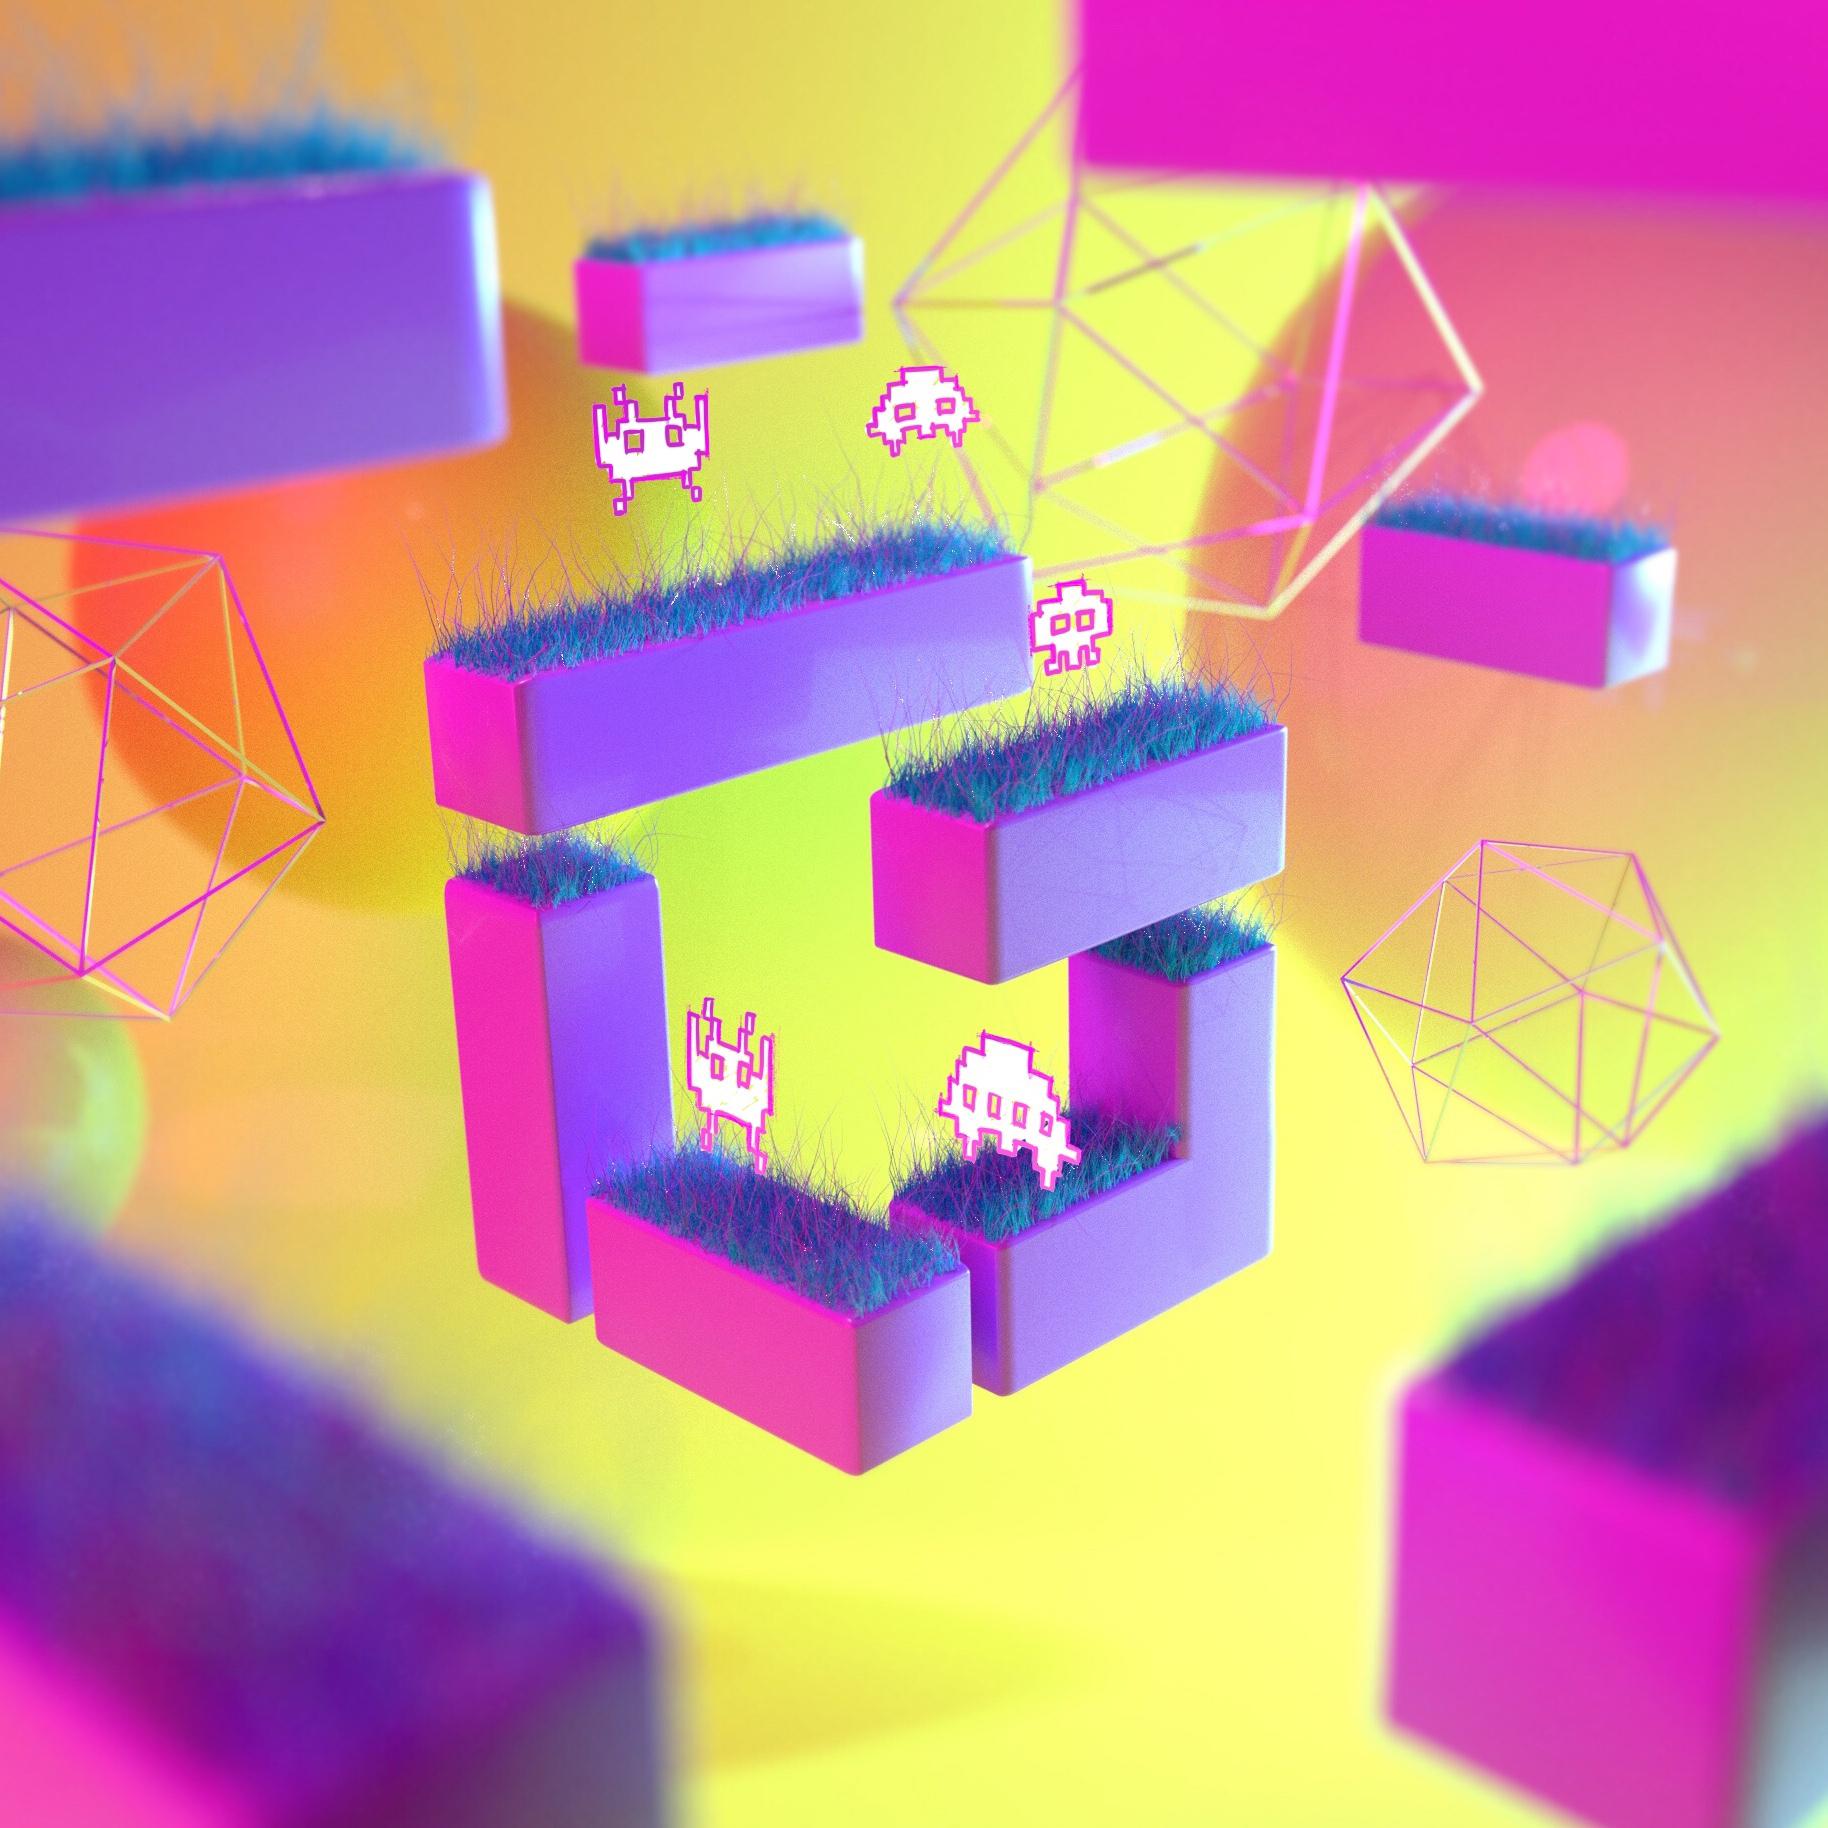 chris-winterton-G-typography-3D-36daysoftype.jpg